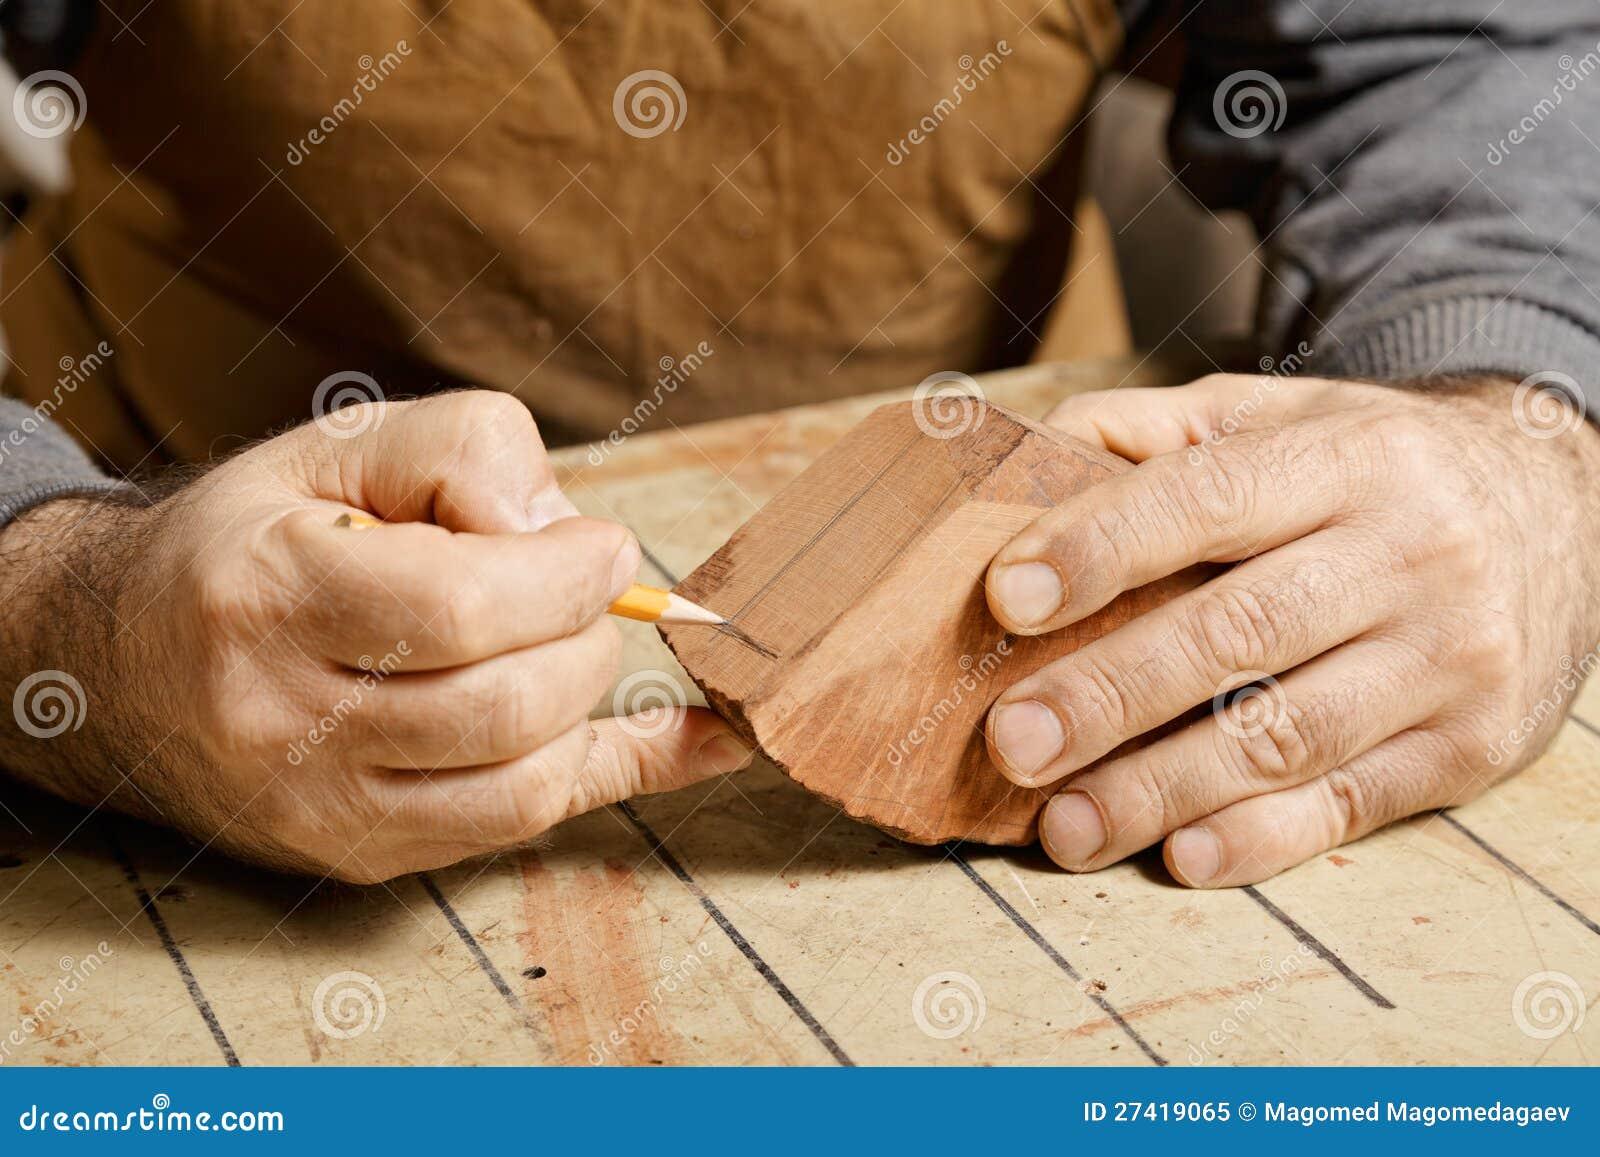 Artisan Hands Sketching On Wood Billet Royalty Free Stock